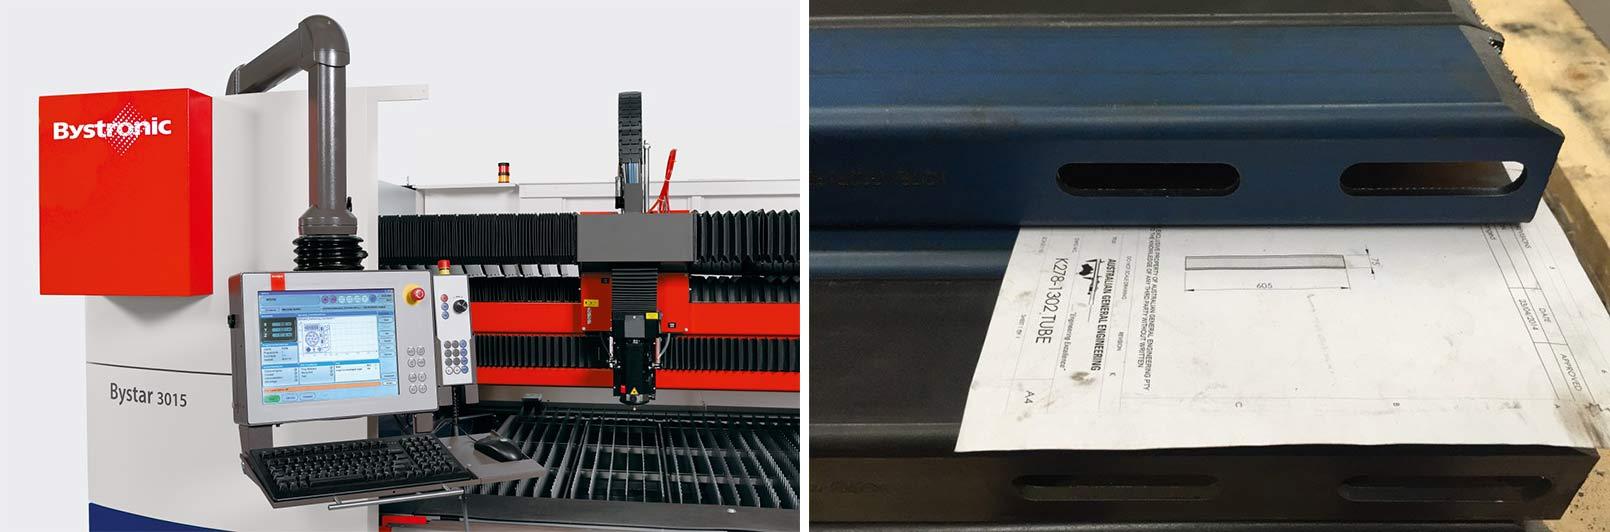 australian general engineering bystar machine and laser cutting